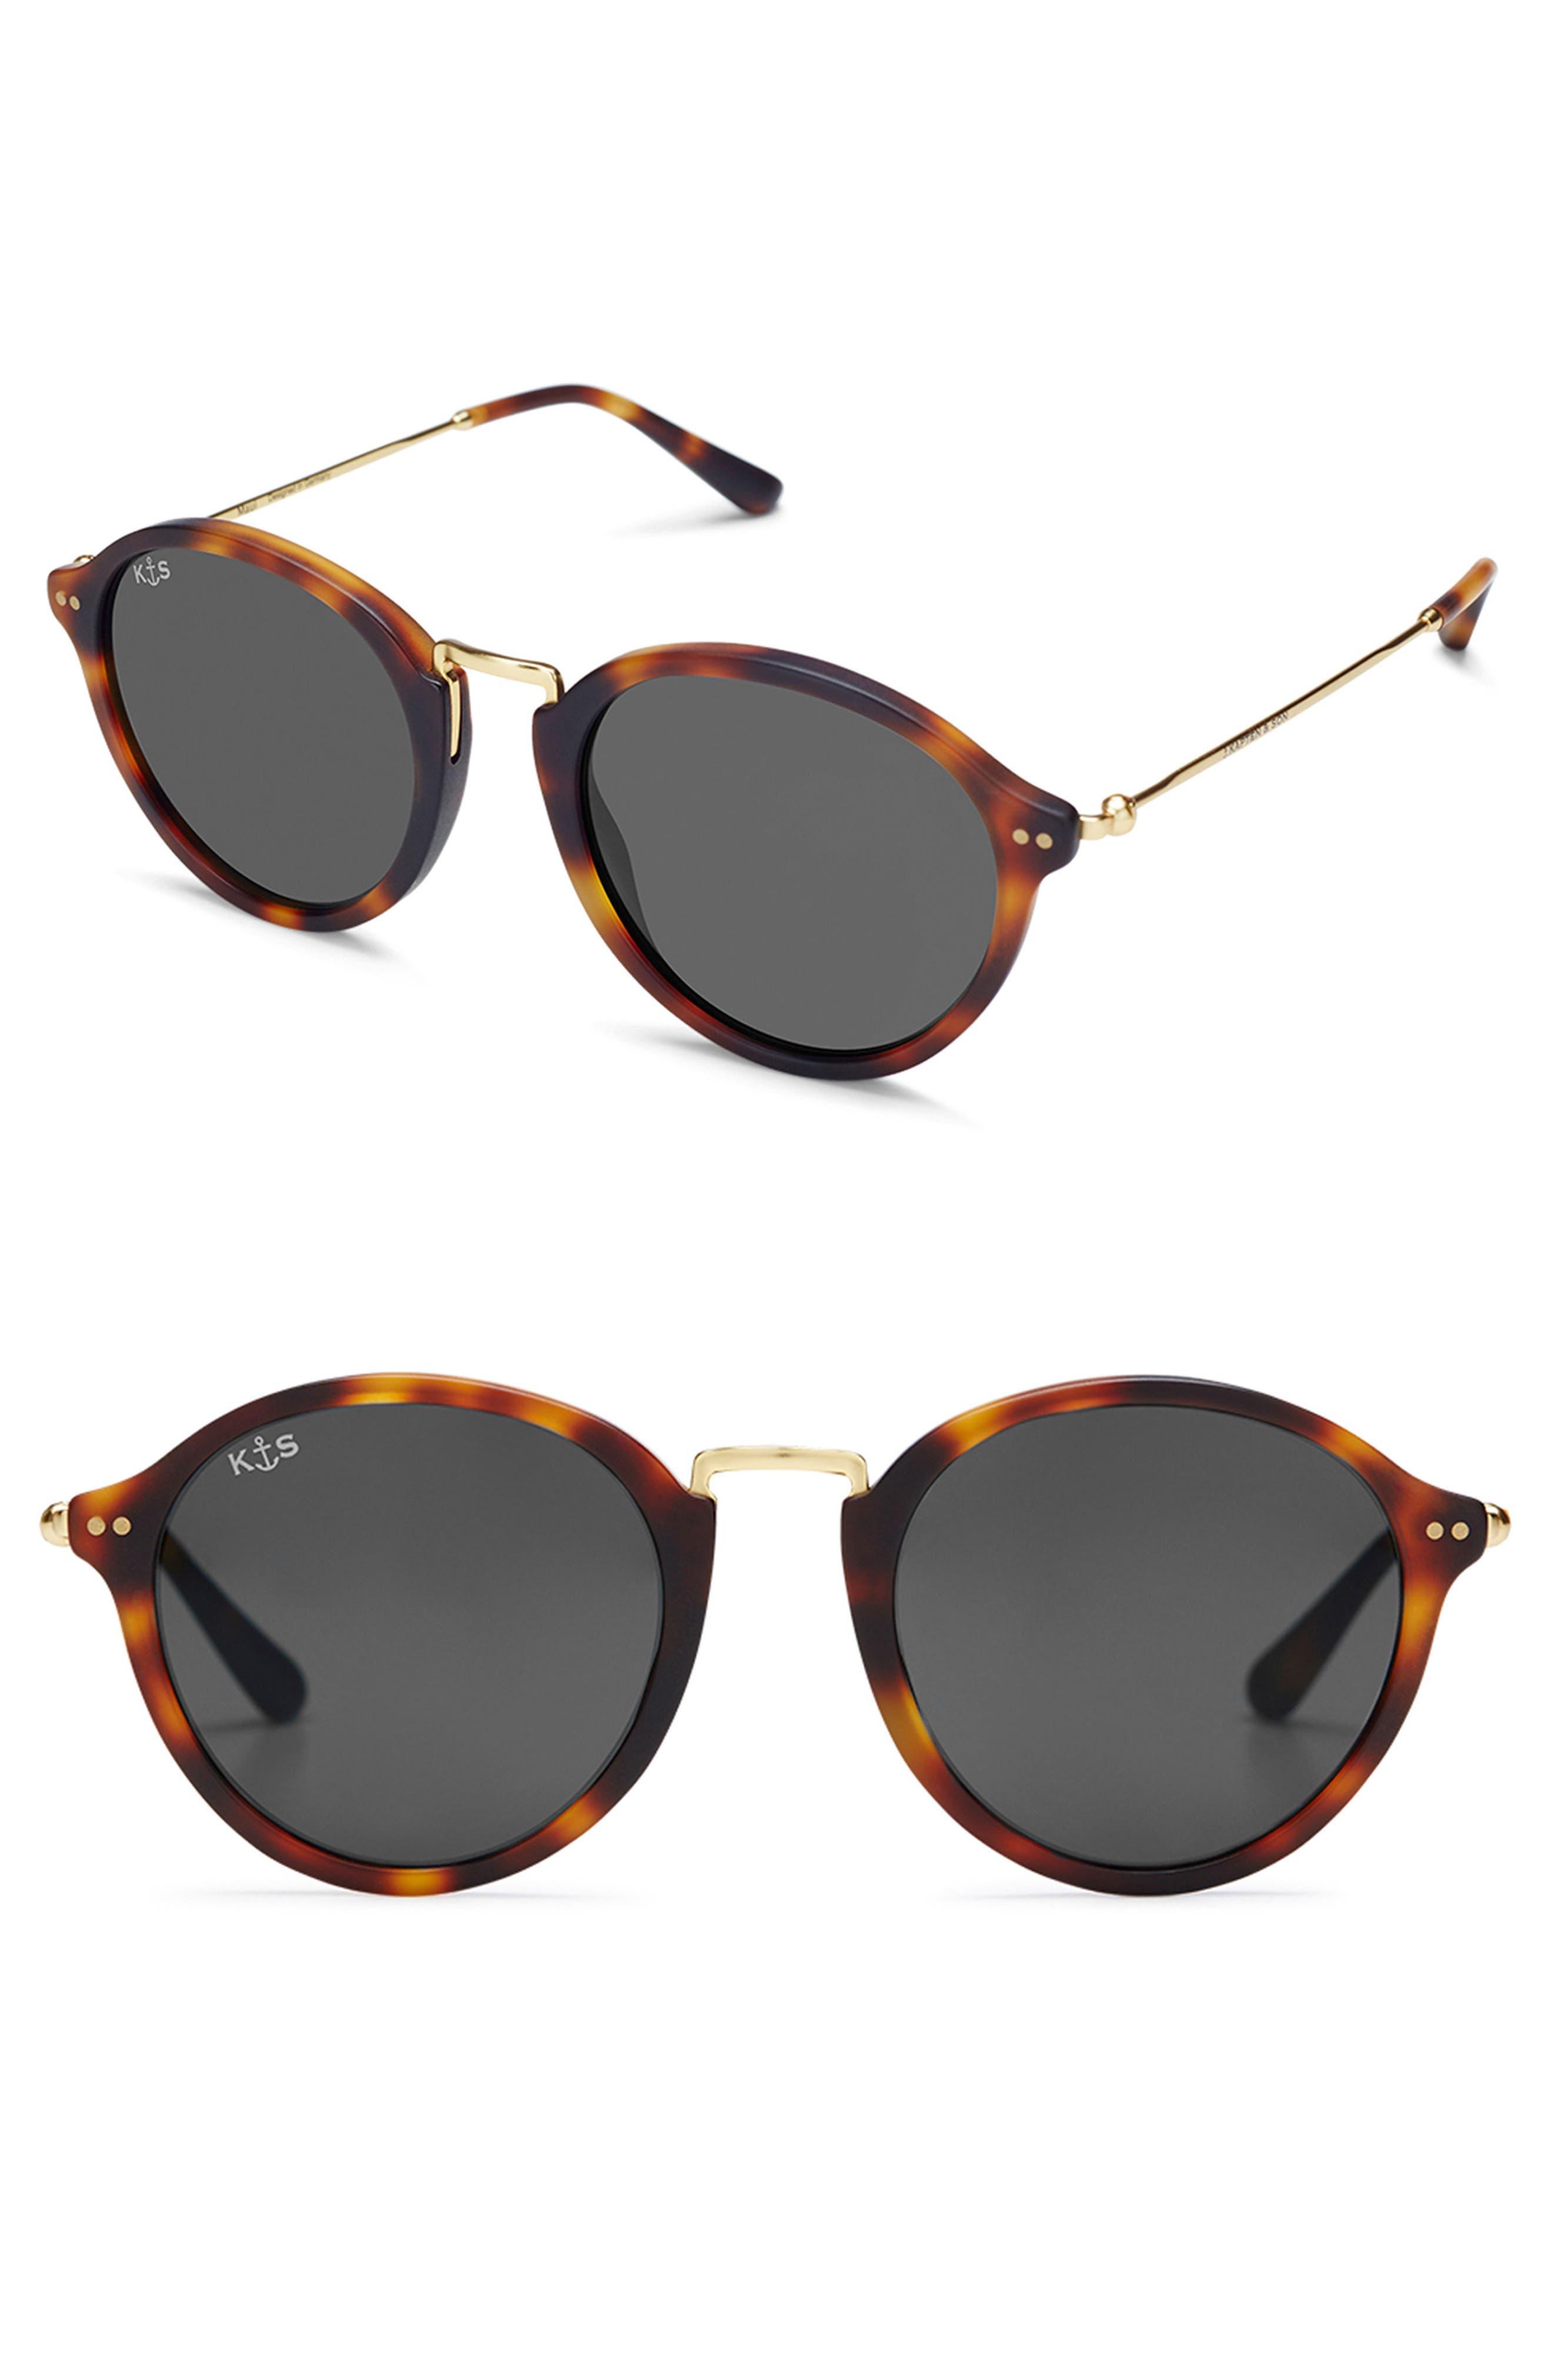 Maui 48mm Sunglasses,                         Main,                         color, TORTOISE/ BLACK